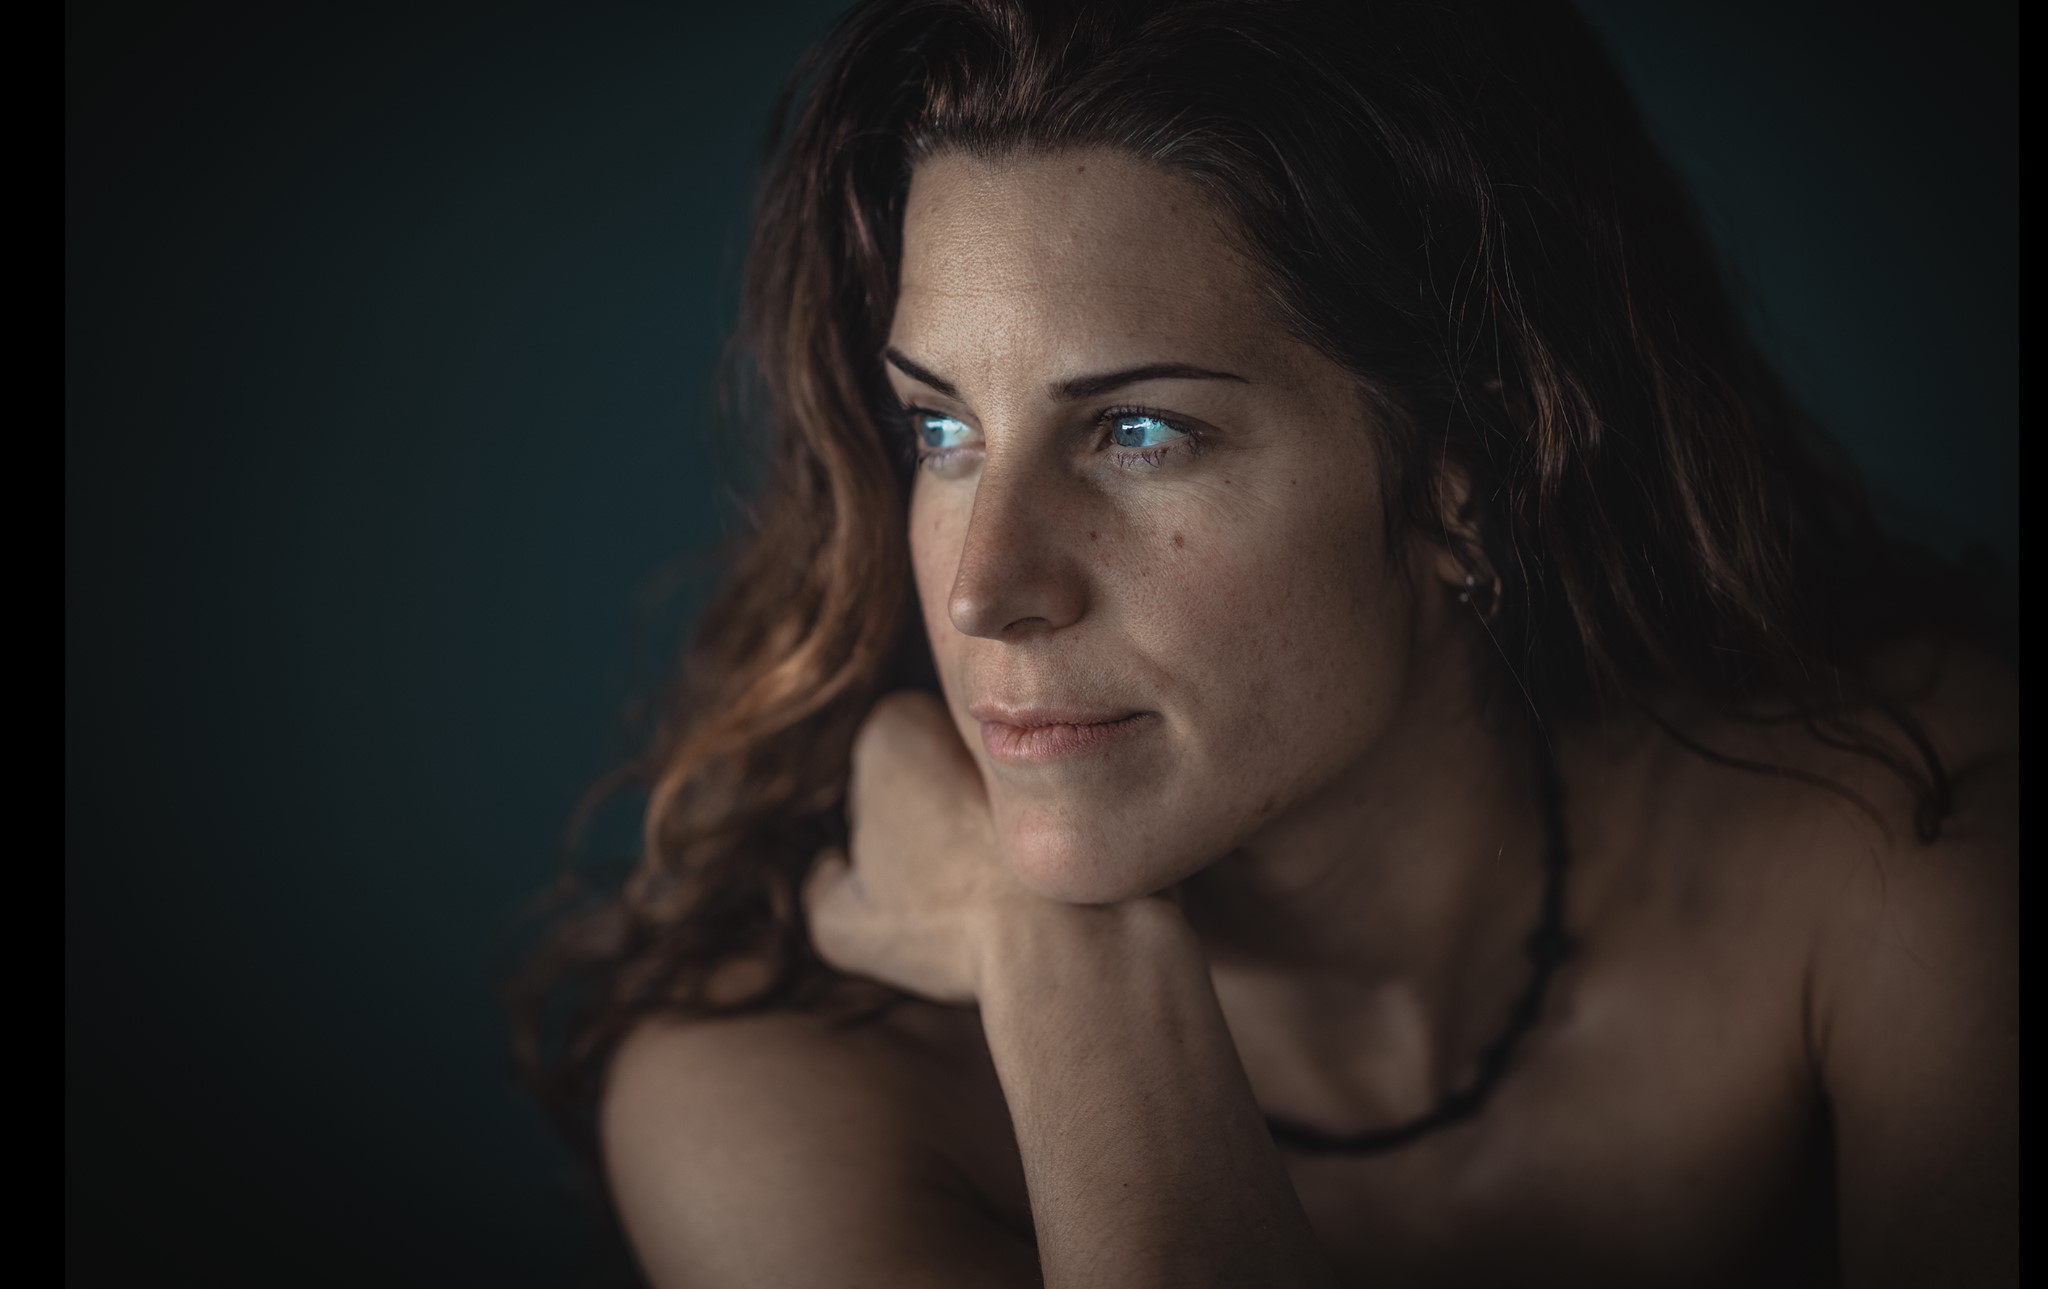 Tamara Lunger civilben